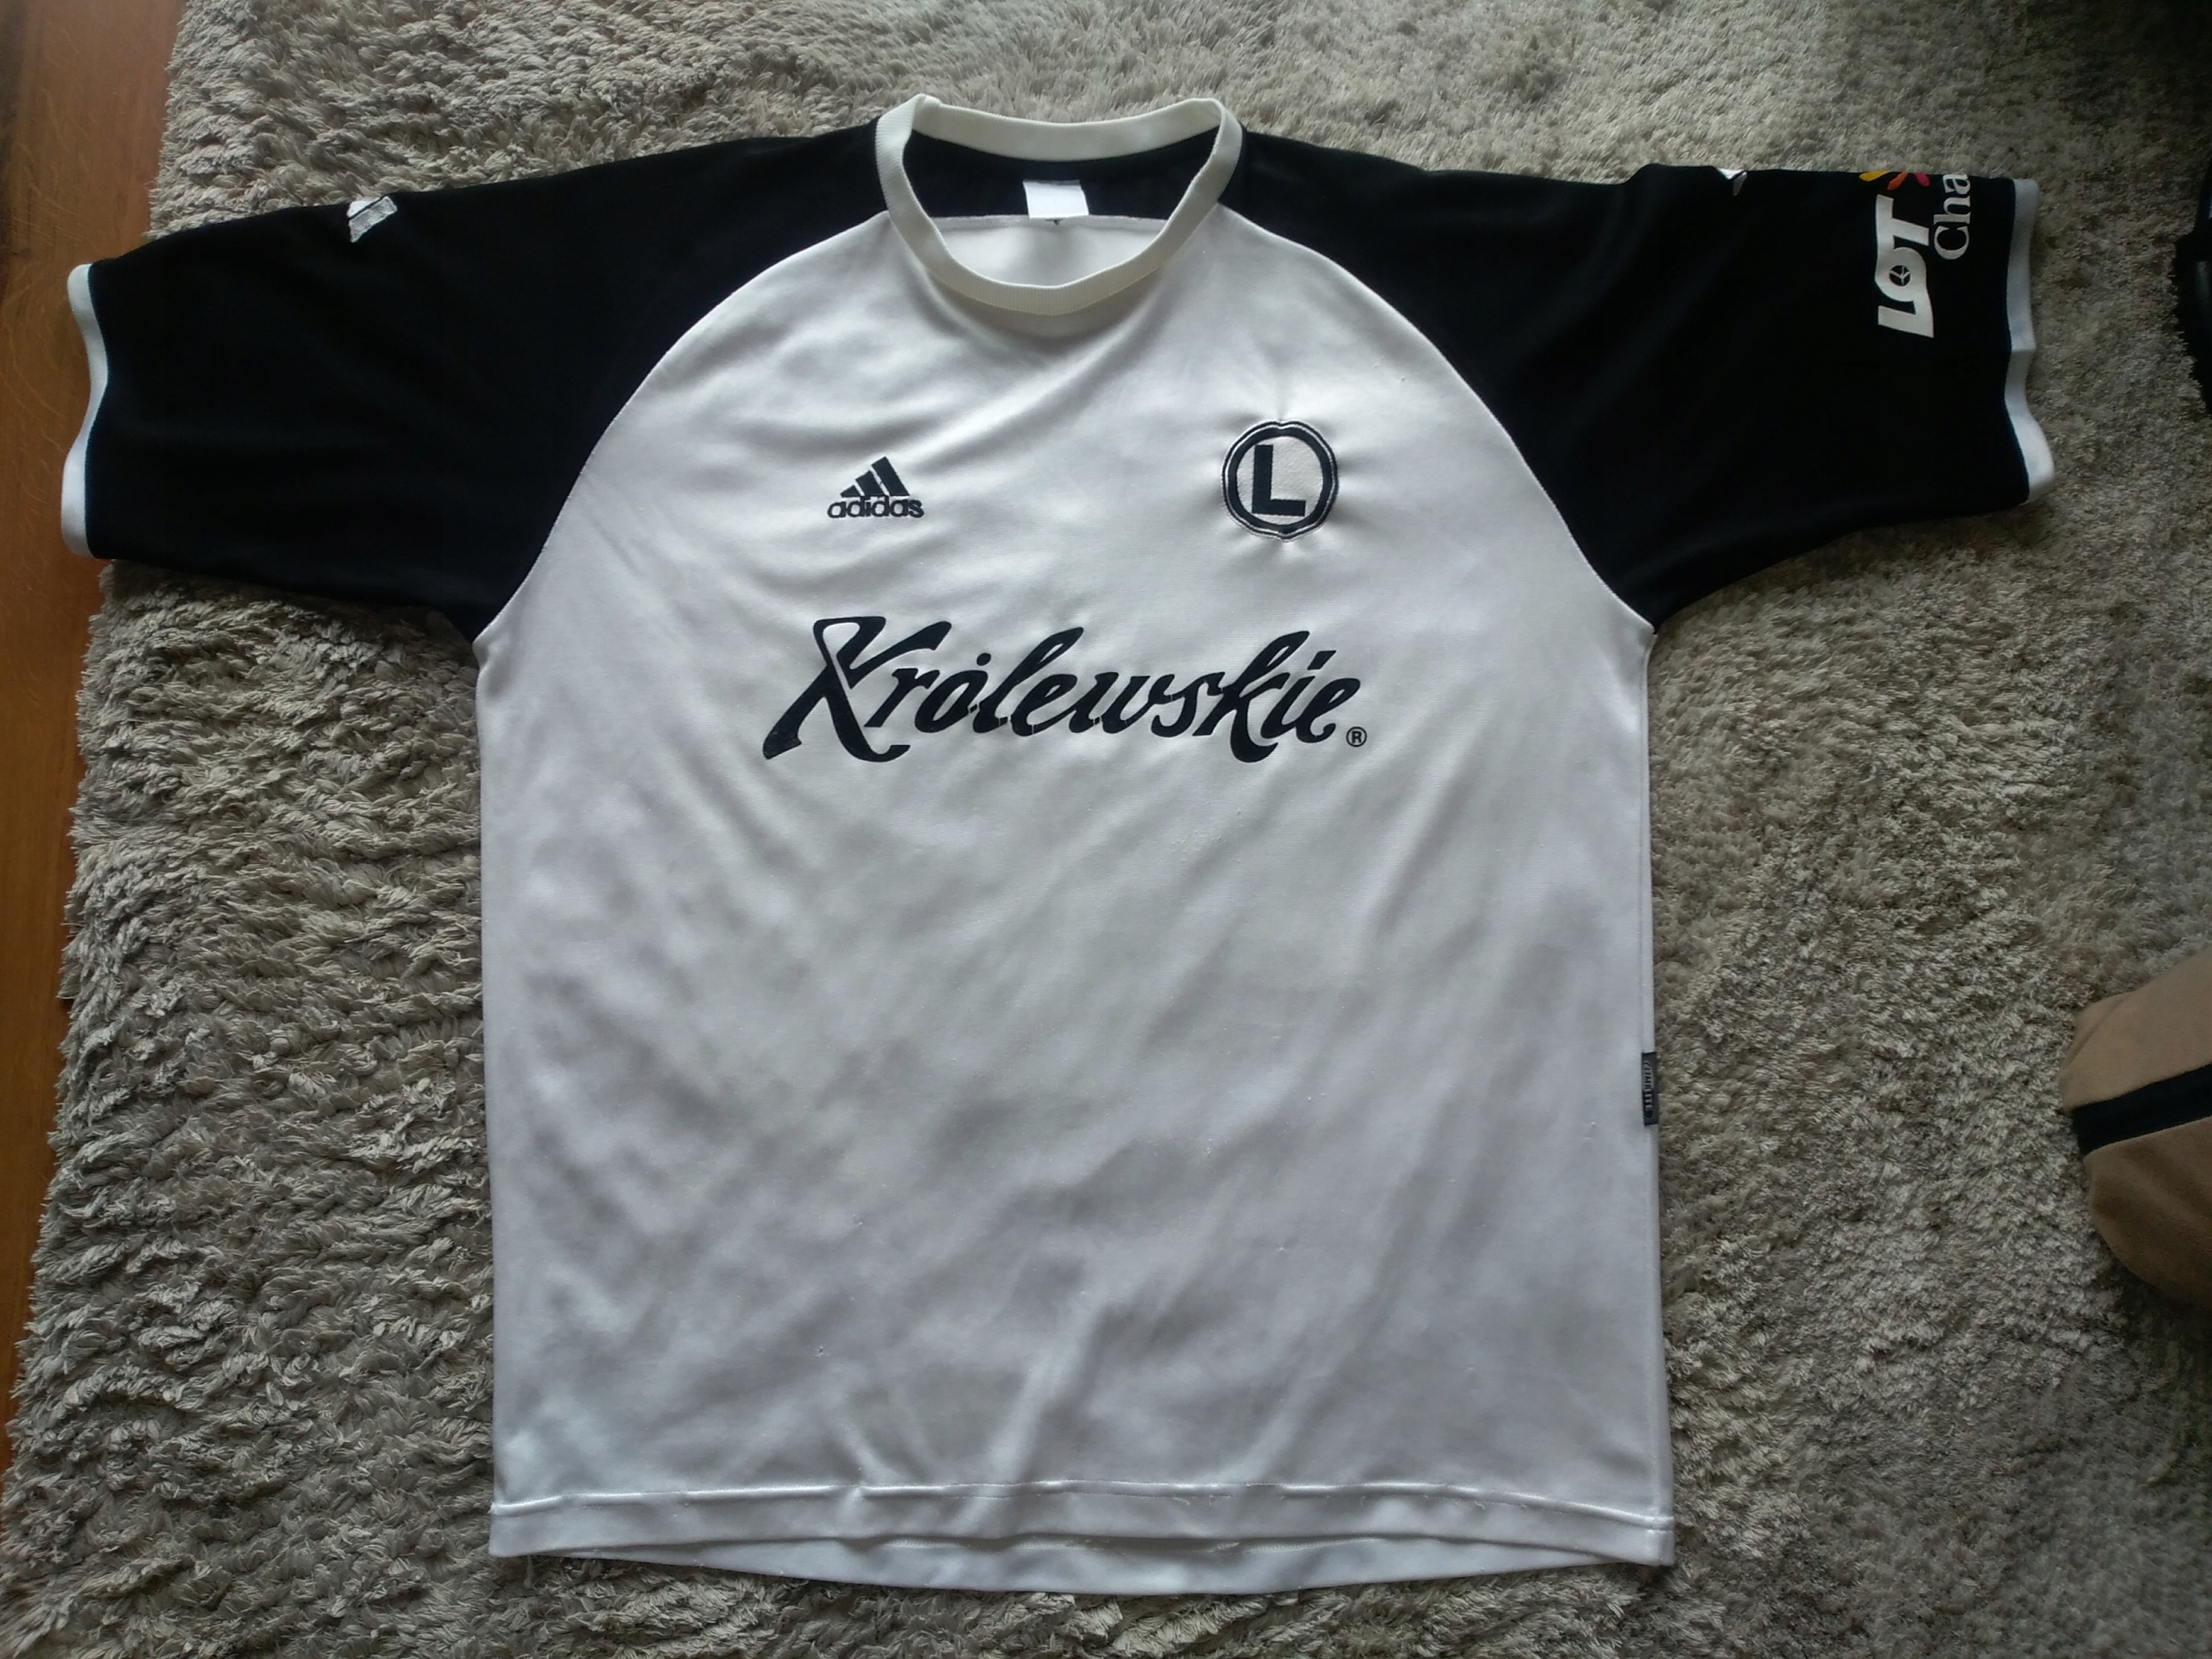 Koszulka Legia Królewskie 03/04 rozmiar L adidas